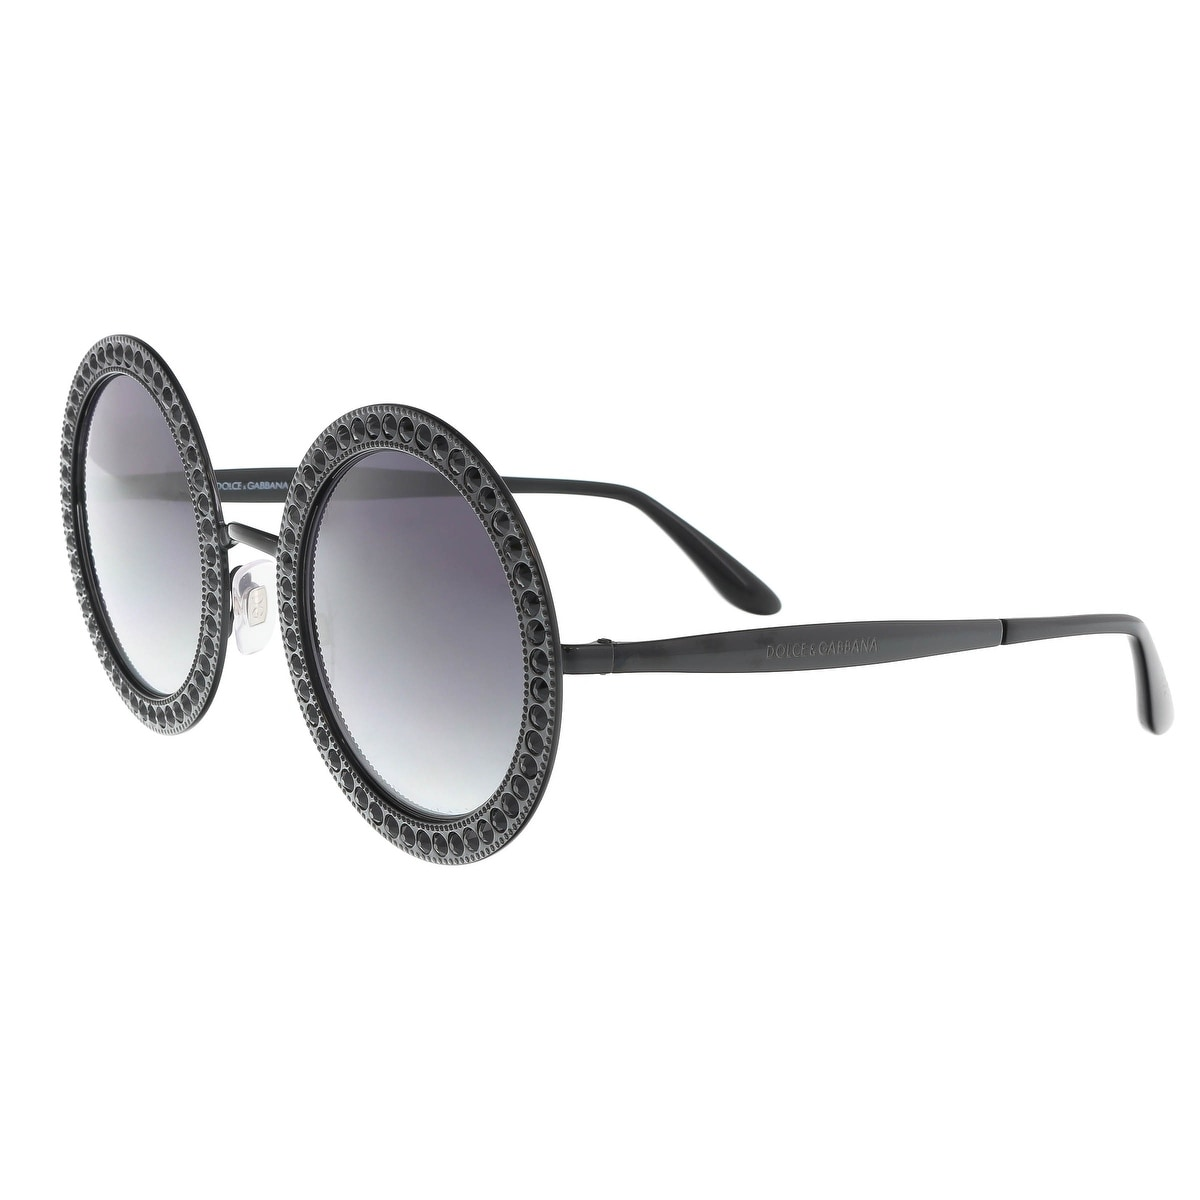 56f7478ca01 Dolce   Gabbana Sunglasses